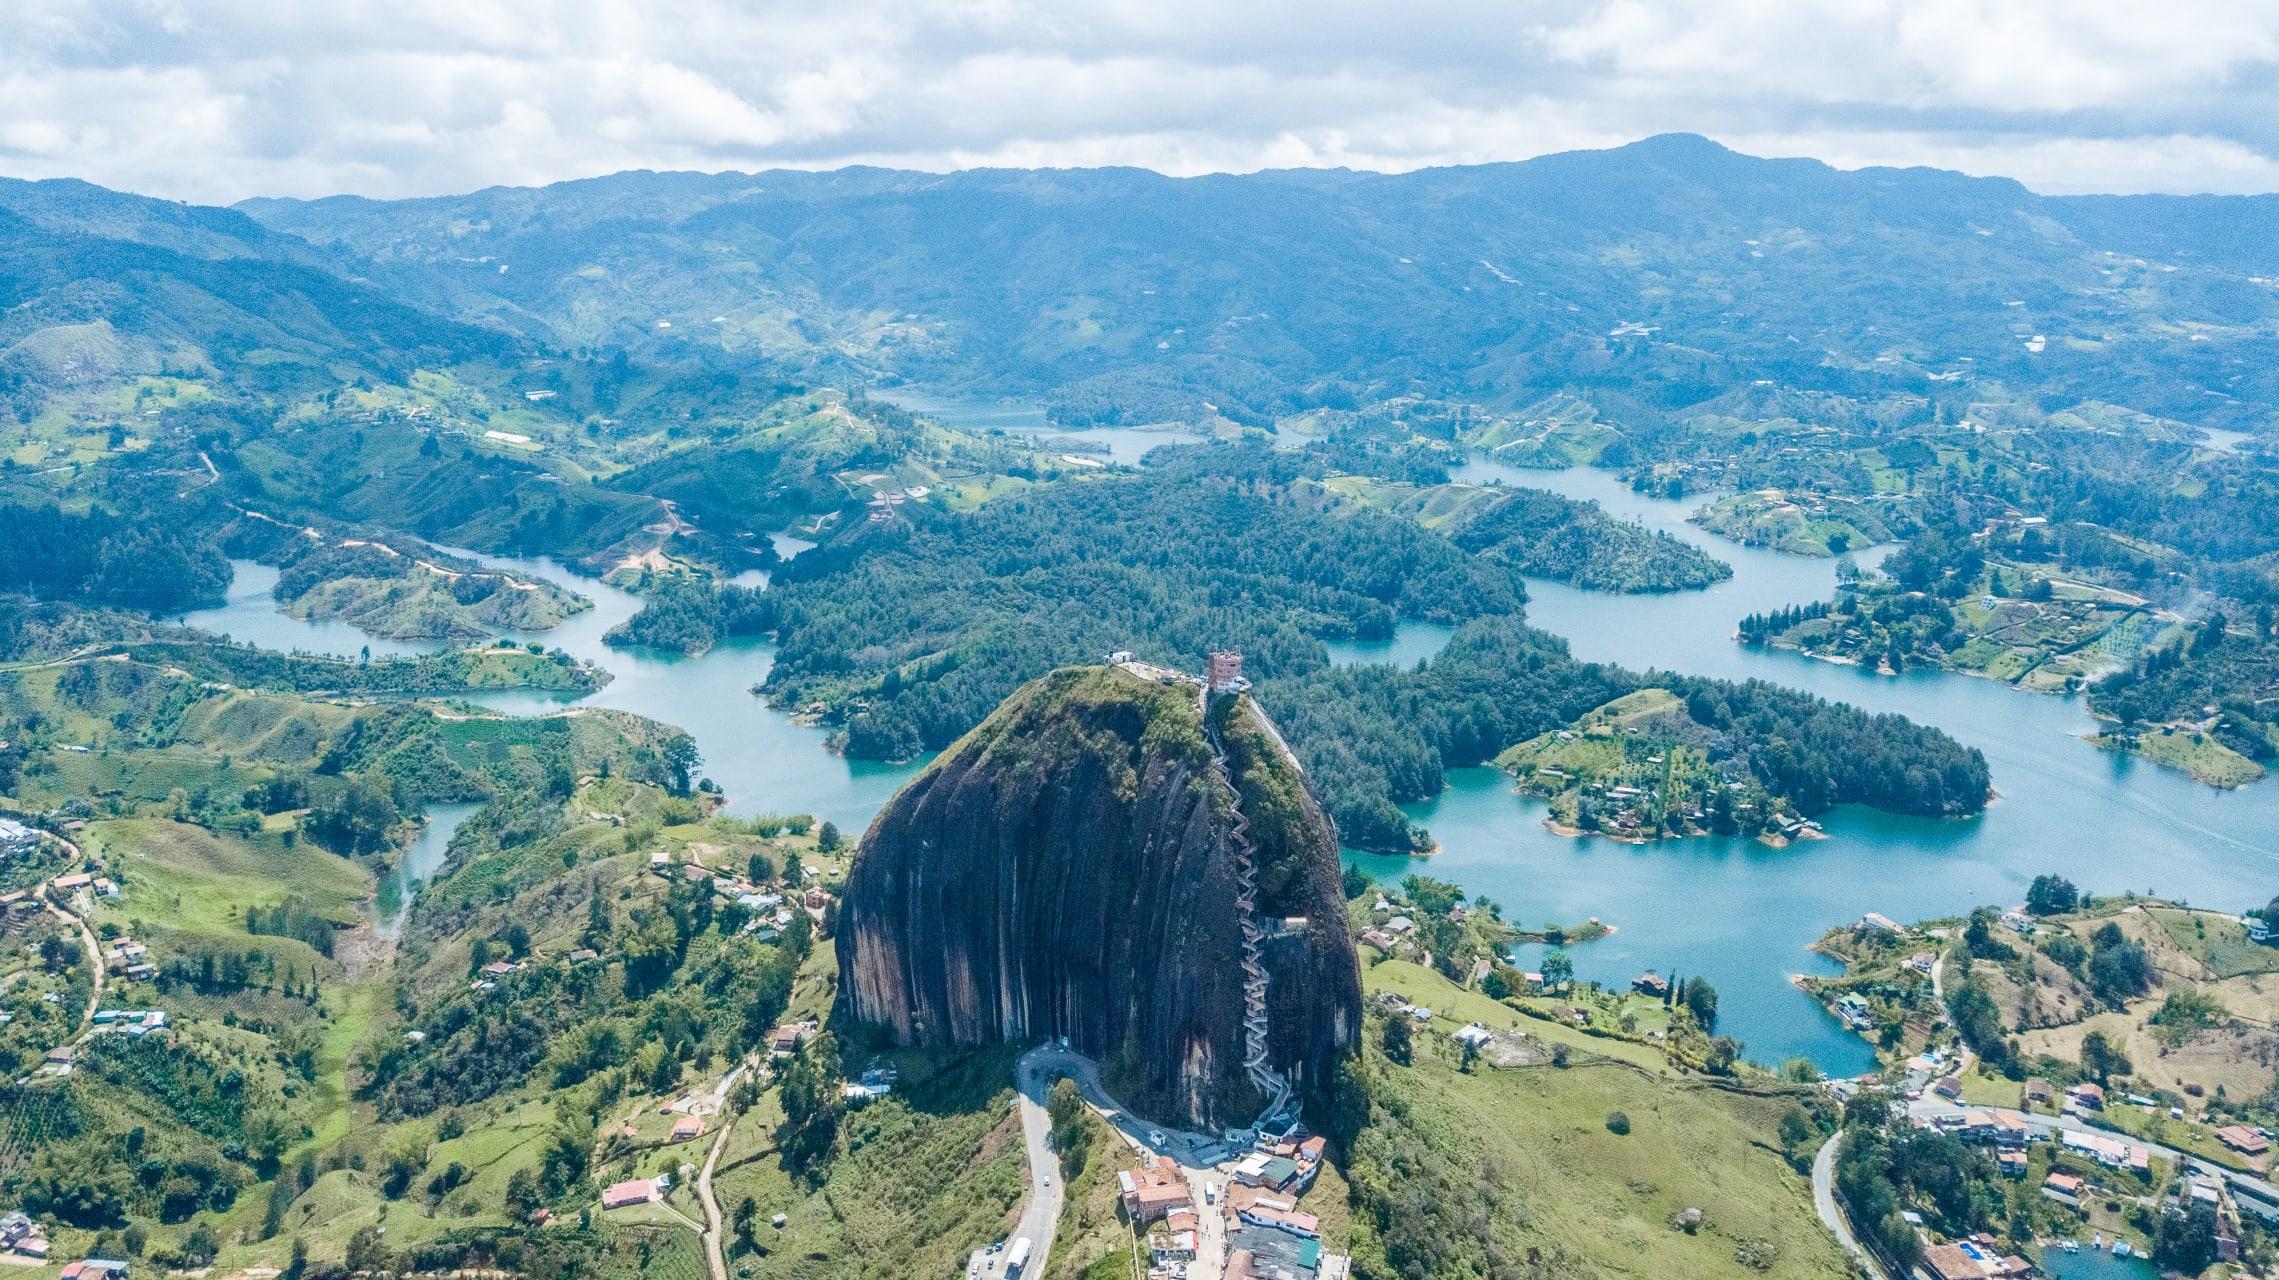 Guatapé - Stunning Views of Colombia's Highest Rock: Guatapé